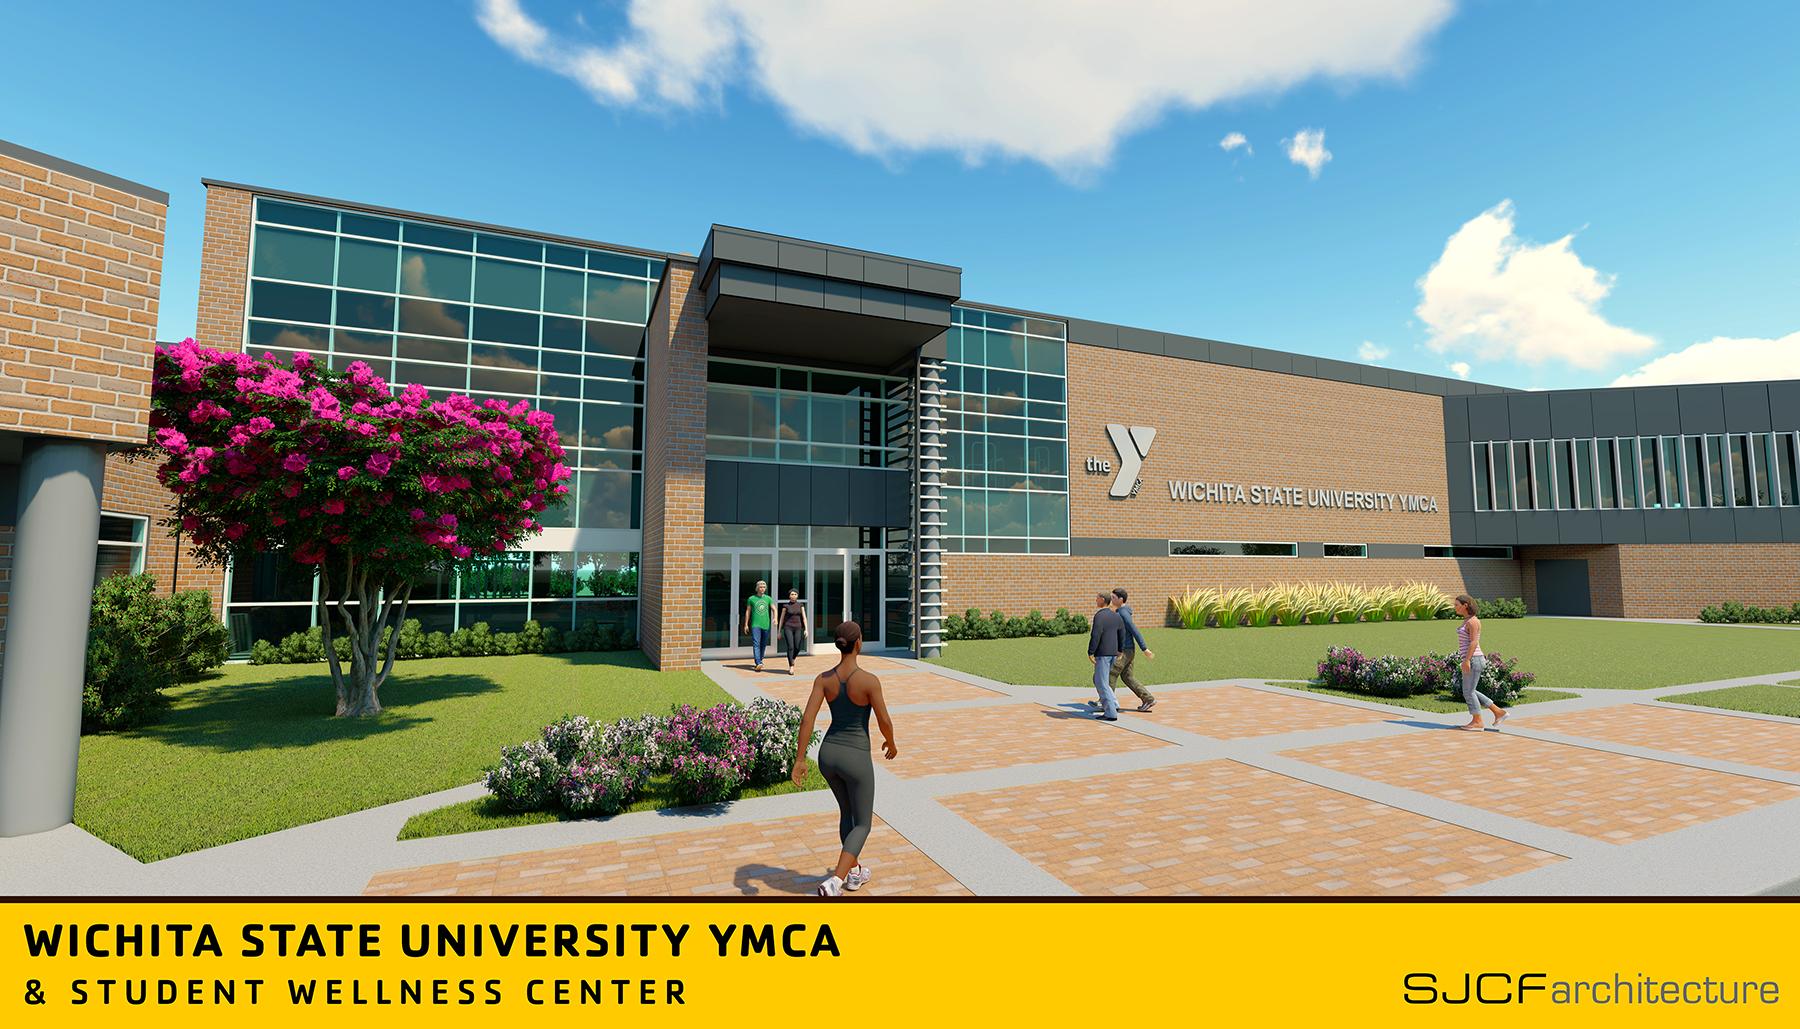 Wichita State University YMCA